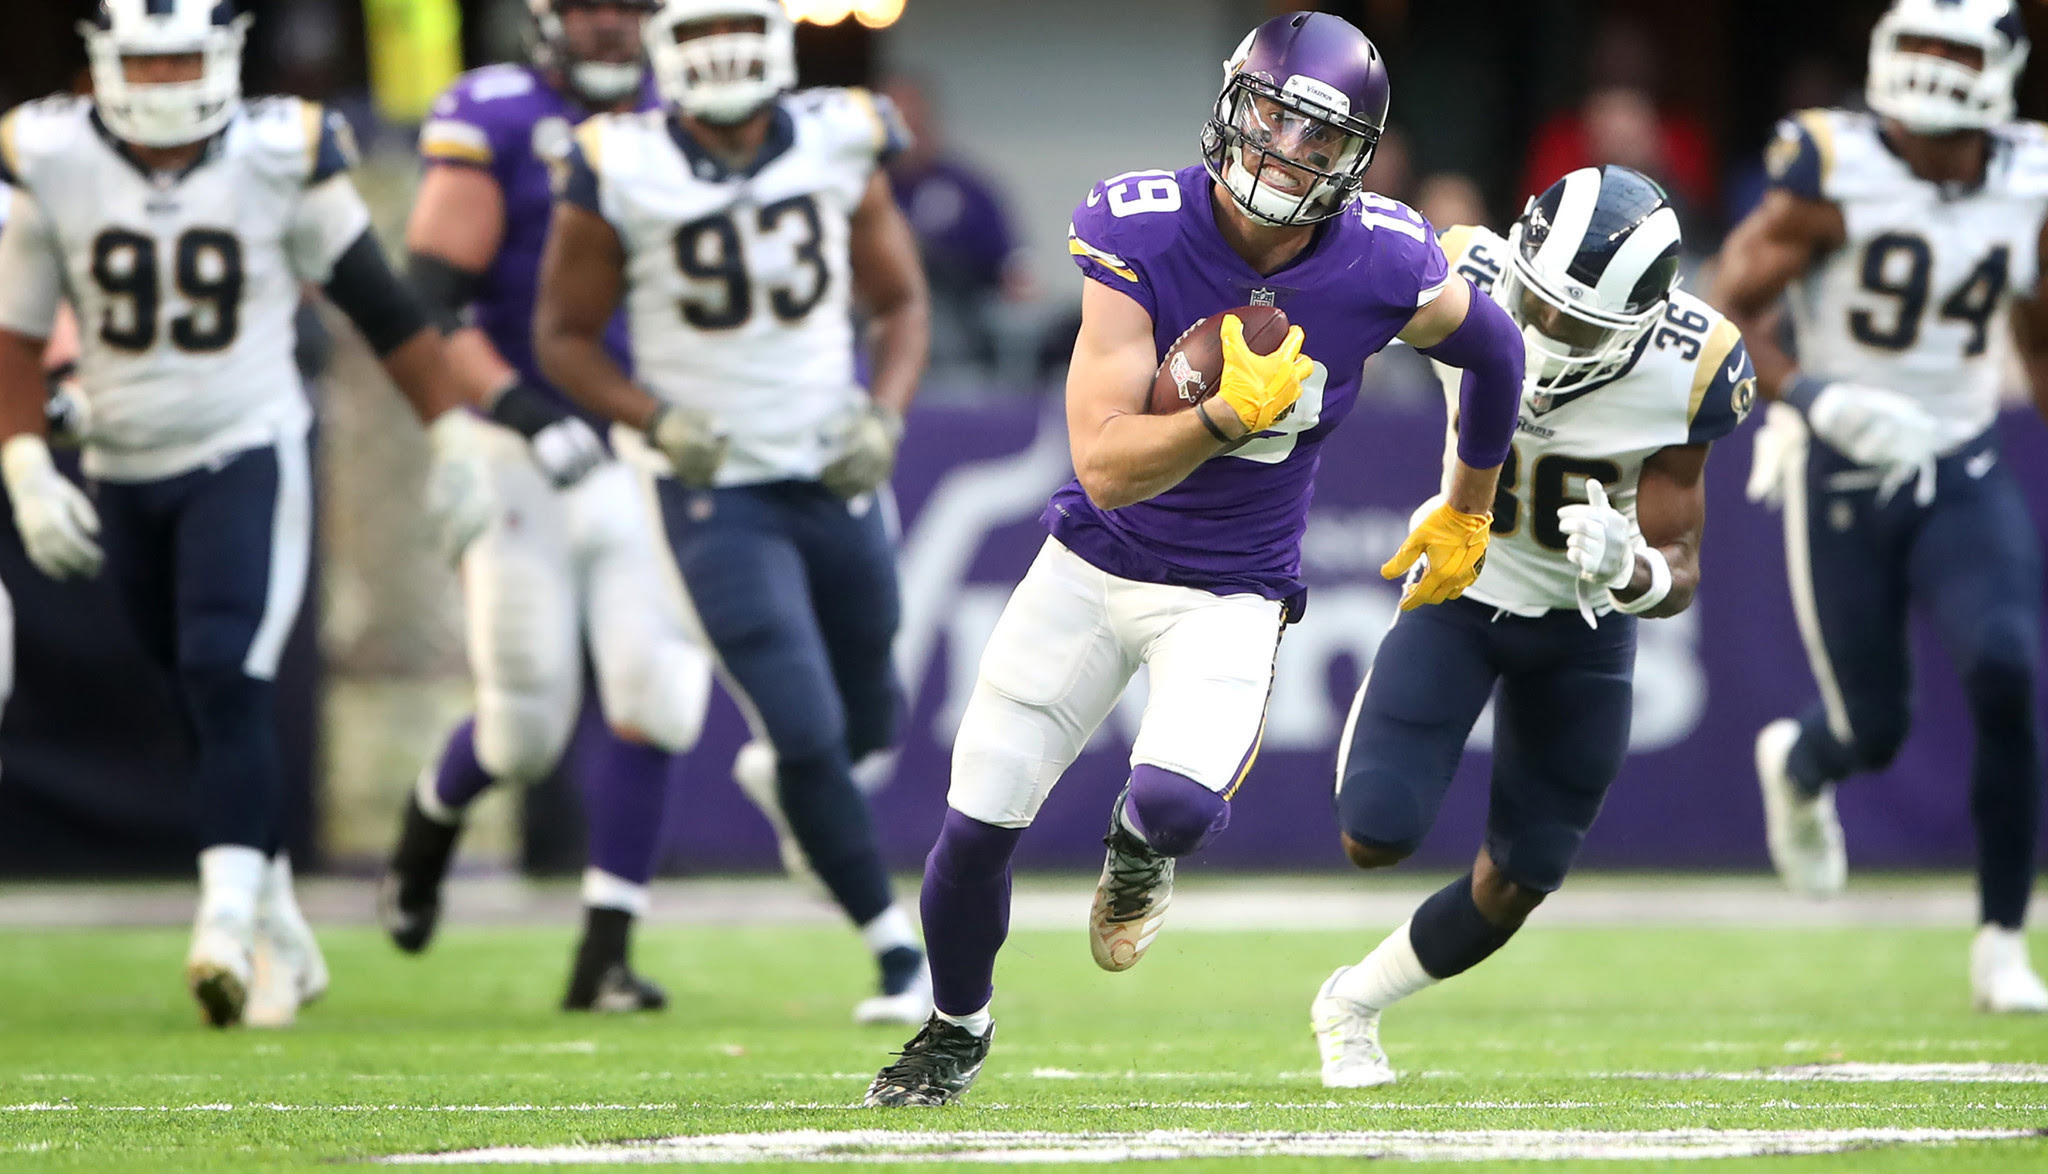 Ask Farmer: Do bright receiver gloves help the quarterback?  Baltimore Sun